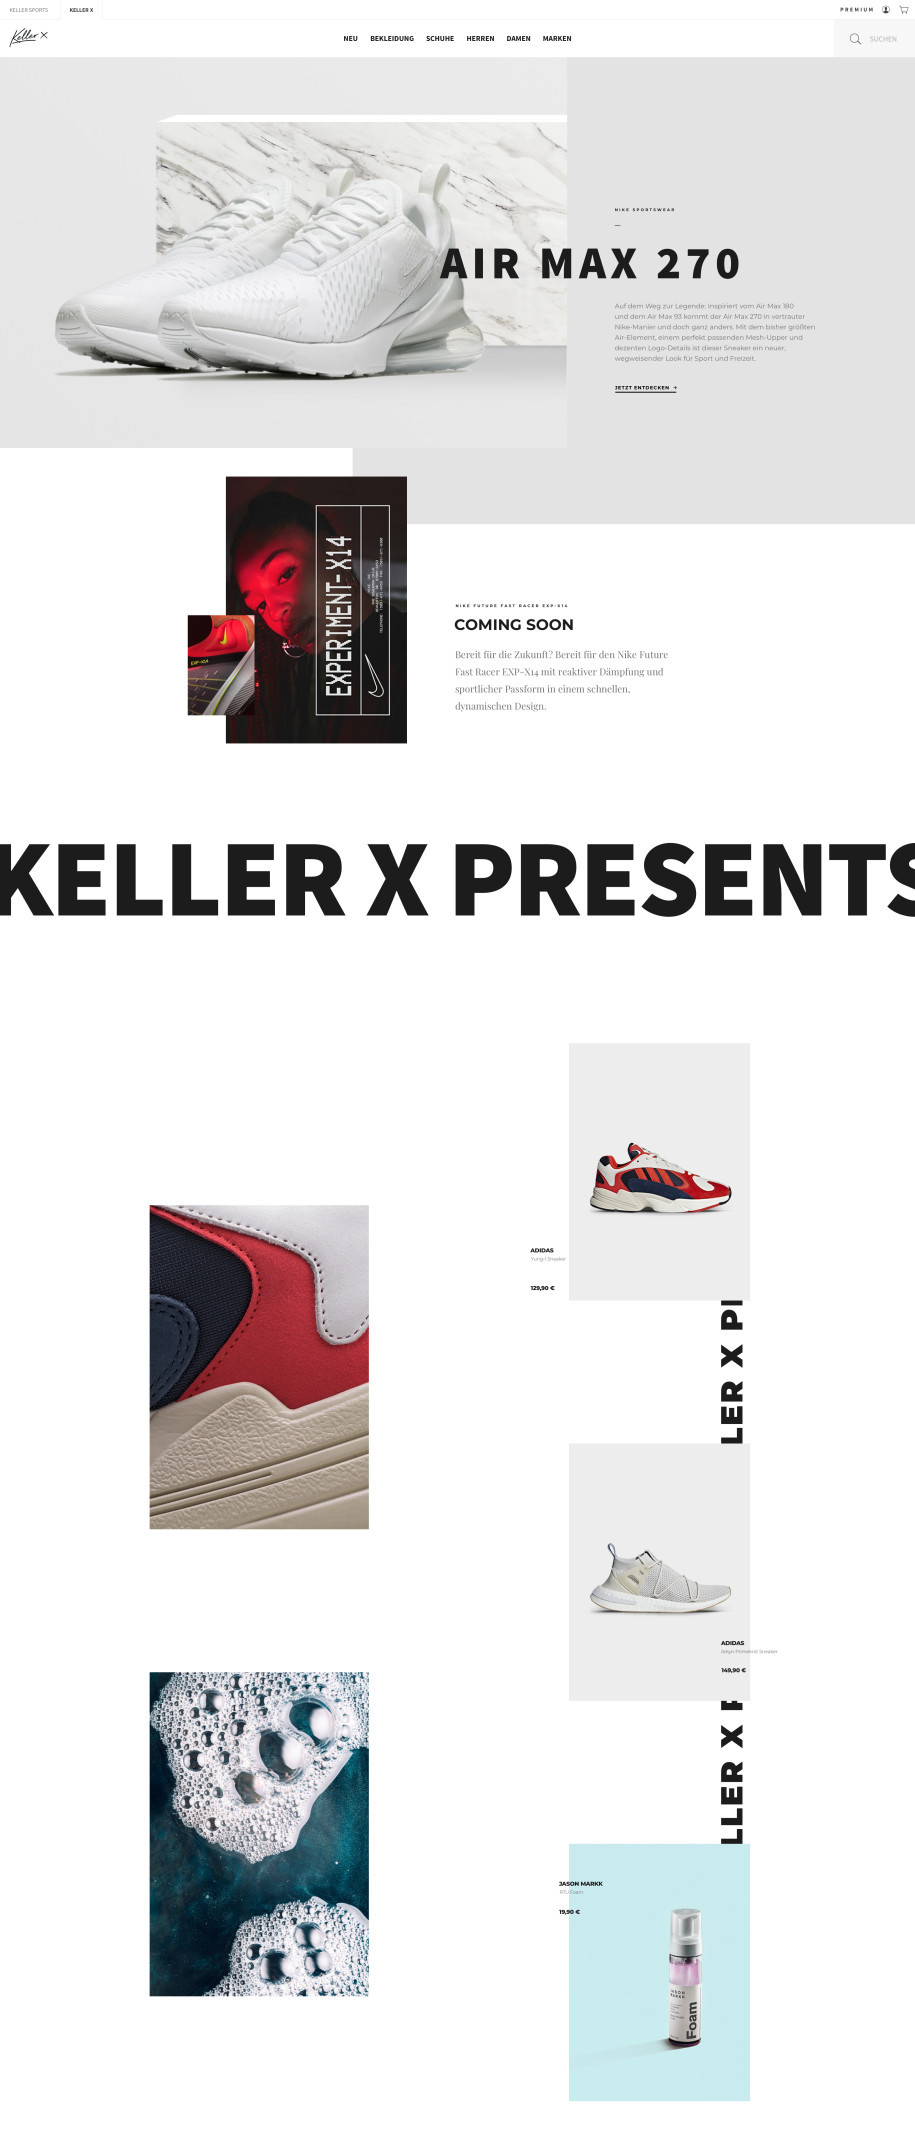 Keller Sports launcht die Lifestyle-Plattform Keller x - sazsport.de